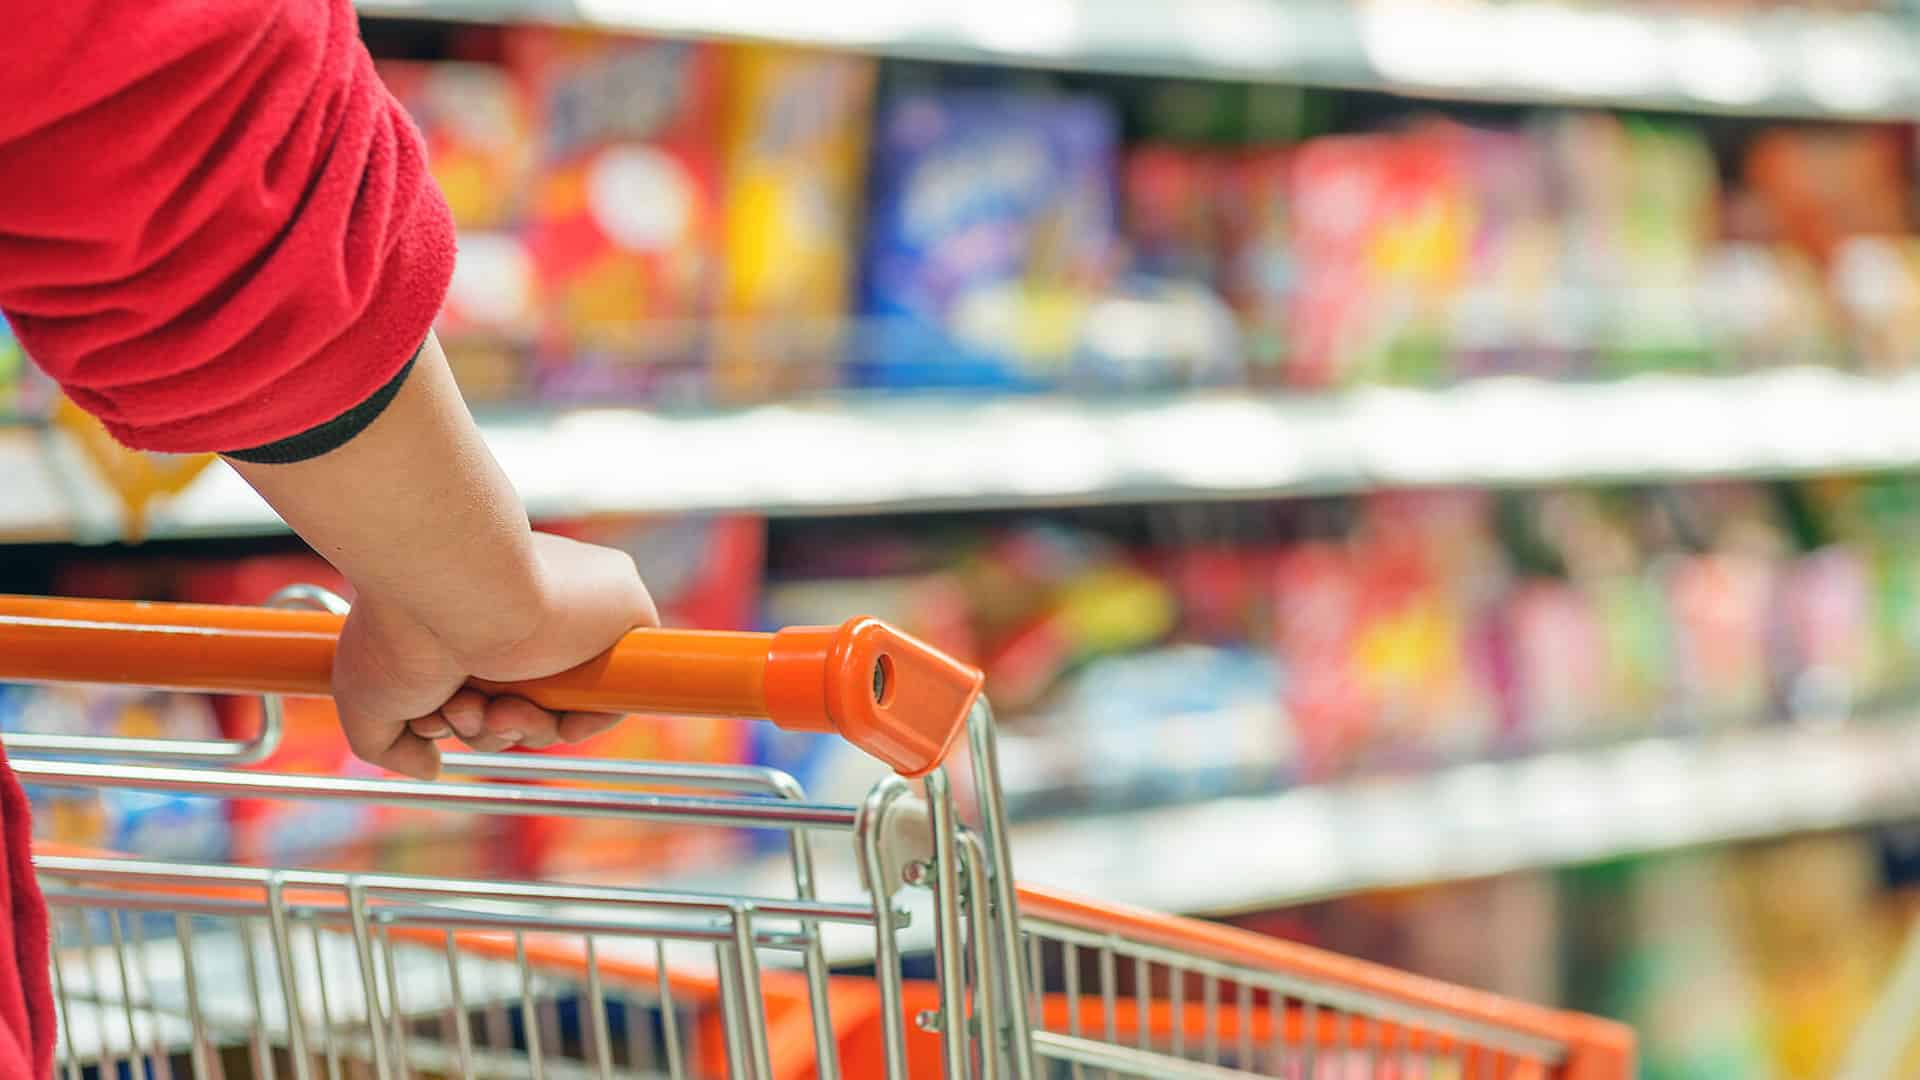 Retails sales near pre-COVID levels with 96 per cent recovery: RAI